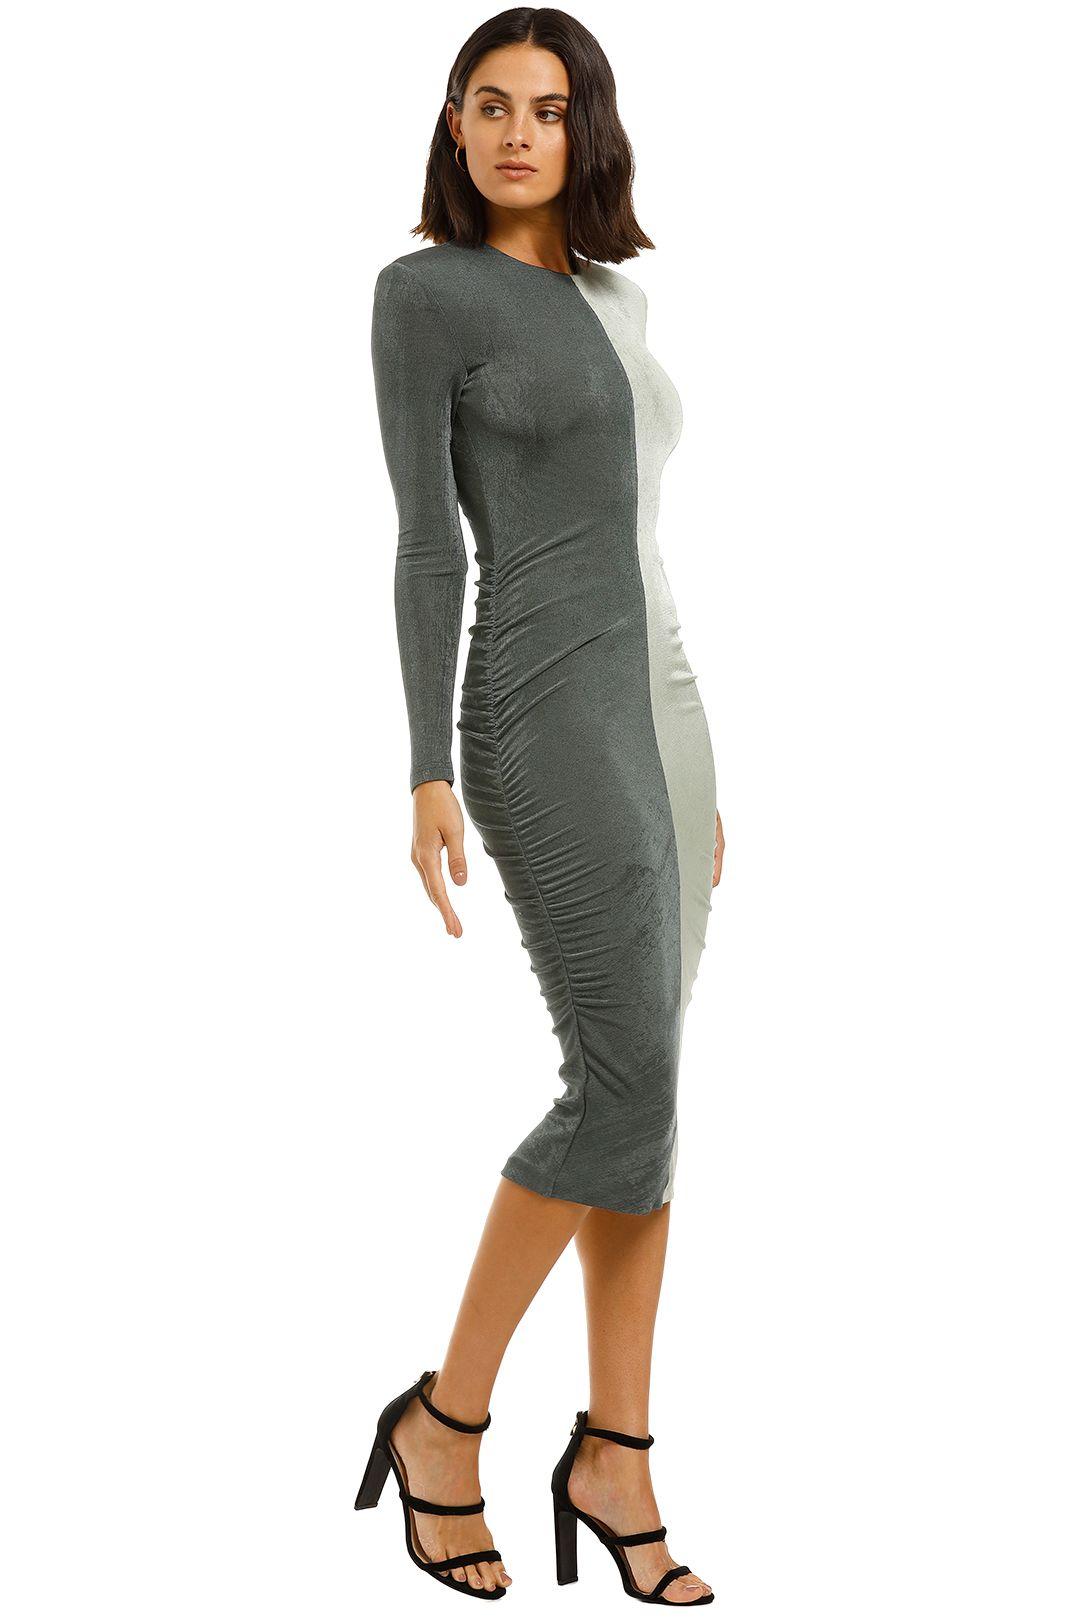 Misha-Leta-Dress-Grey-Side